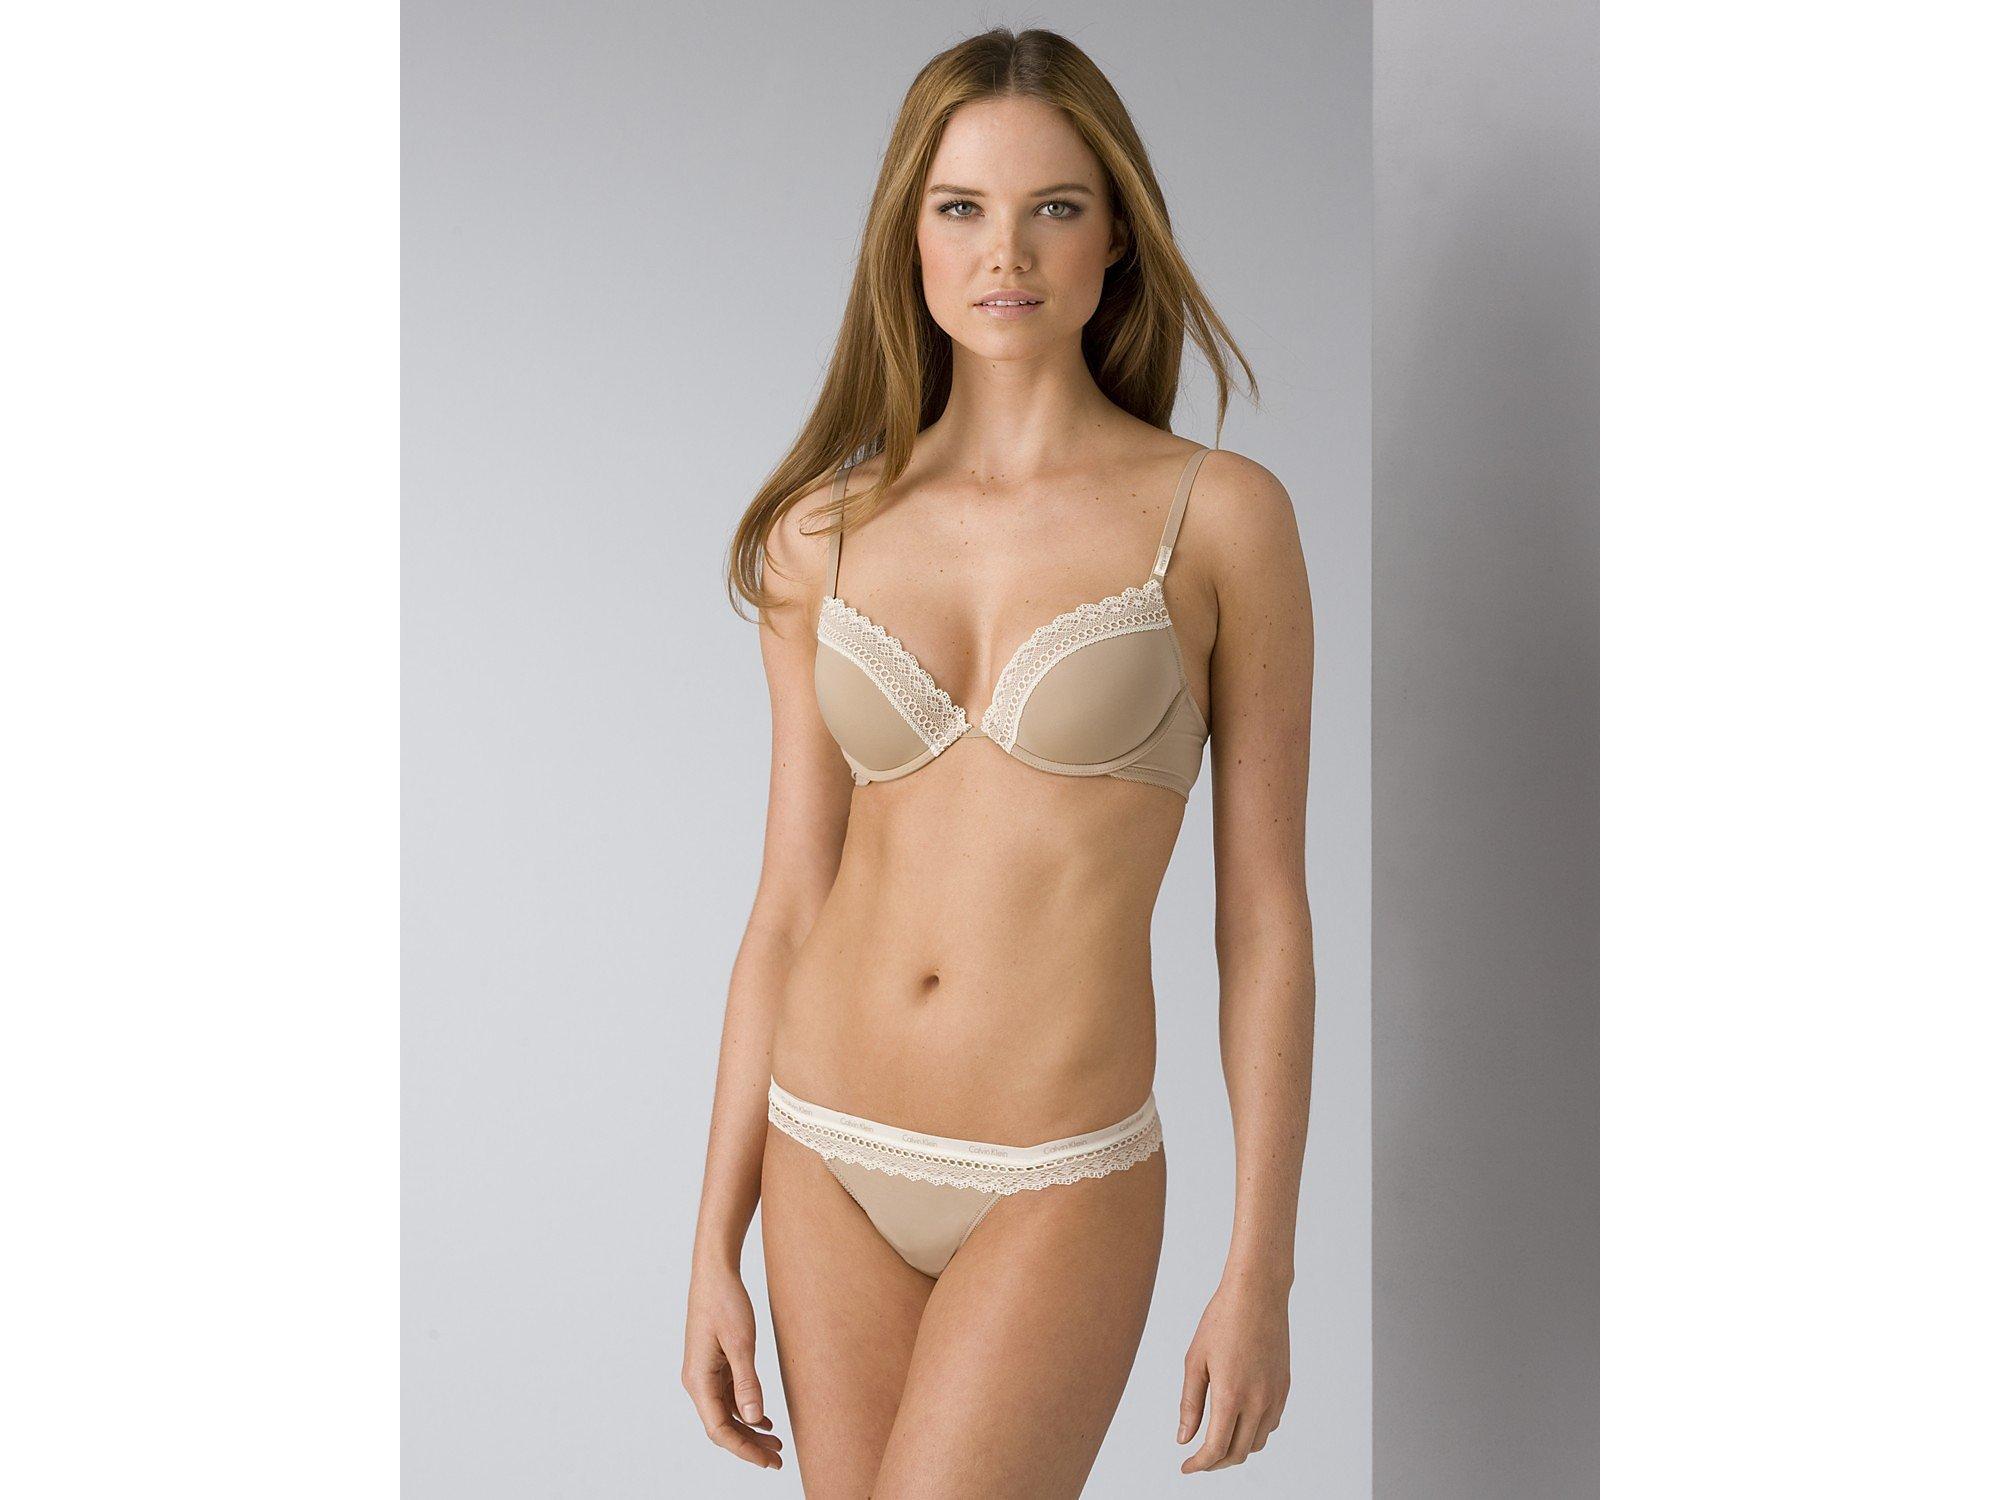 33f16a72e2a Lyst - Calvin Klein Underwear Womens Perfectly Fit Flirty Push-up ...